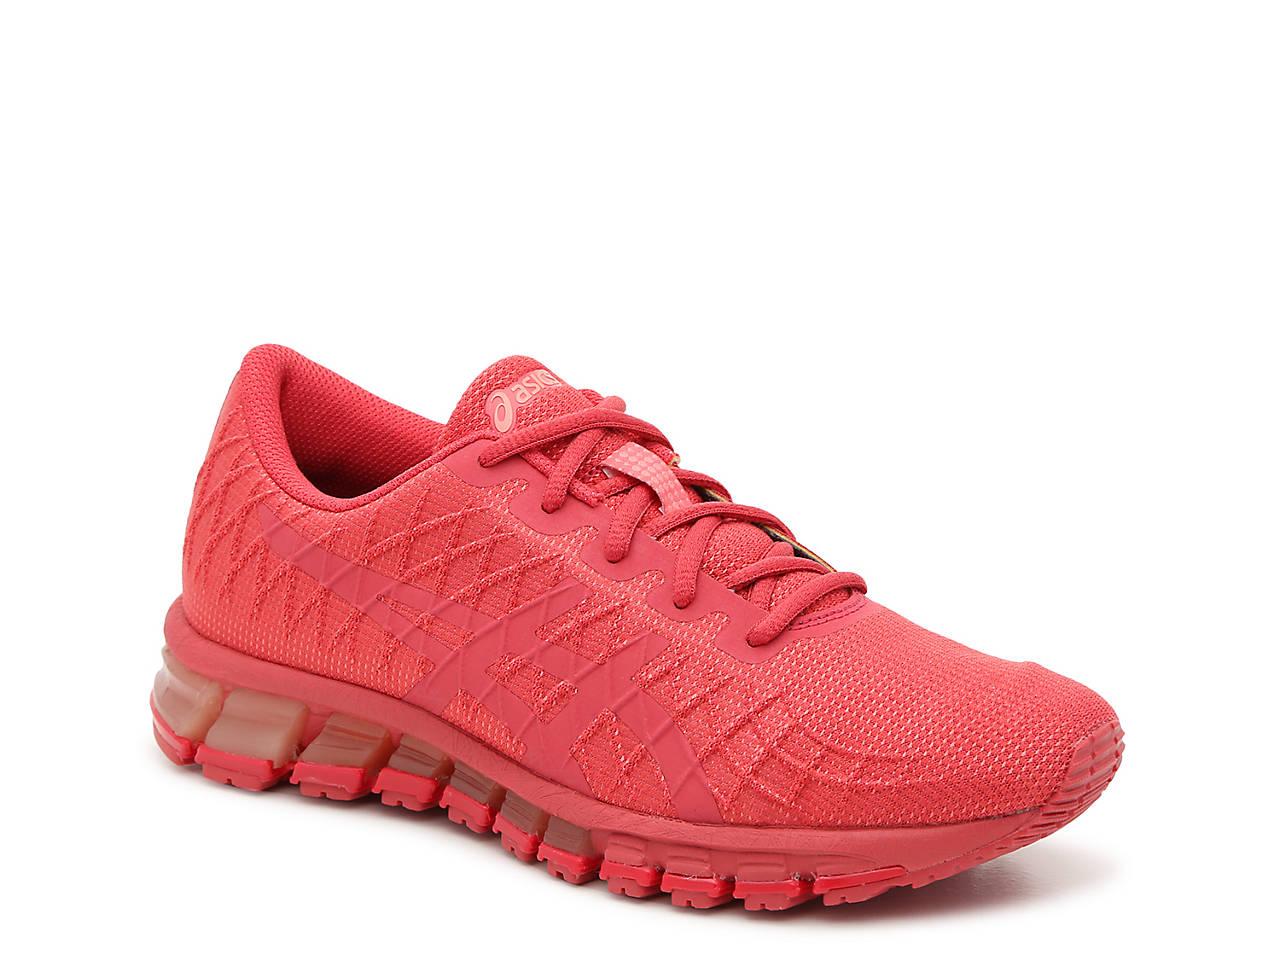 reputable site a1b39 0b6d6 GEL-Quantum 180 4 Running Shoe - Women's